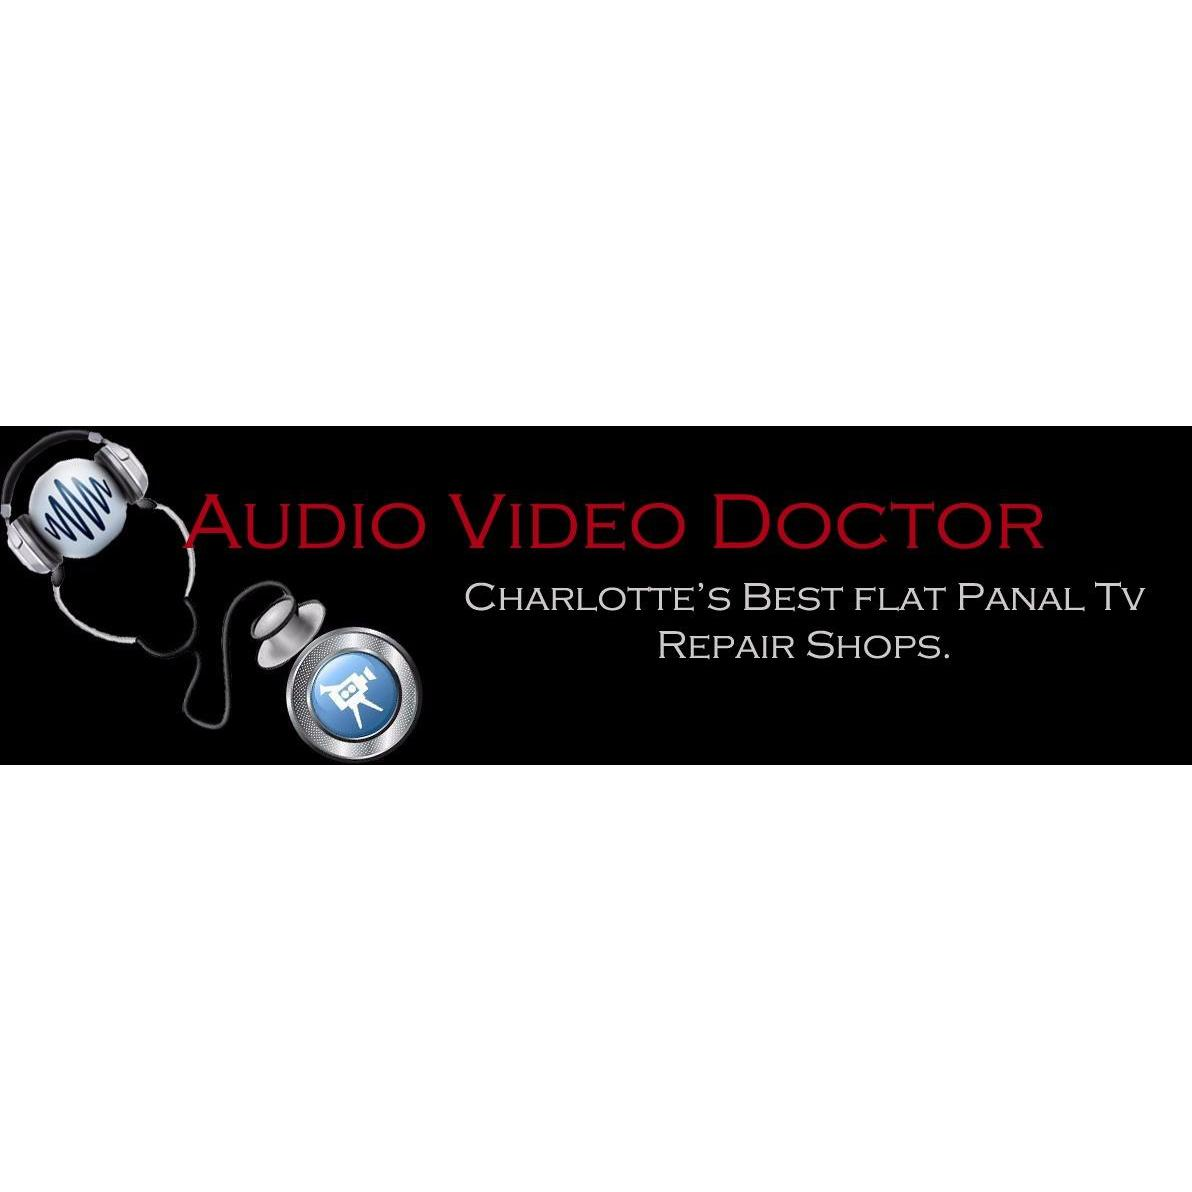 Audio Video Doctor